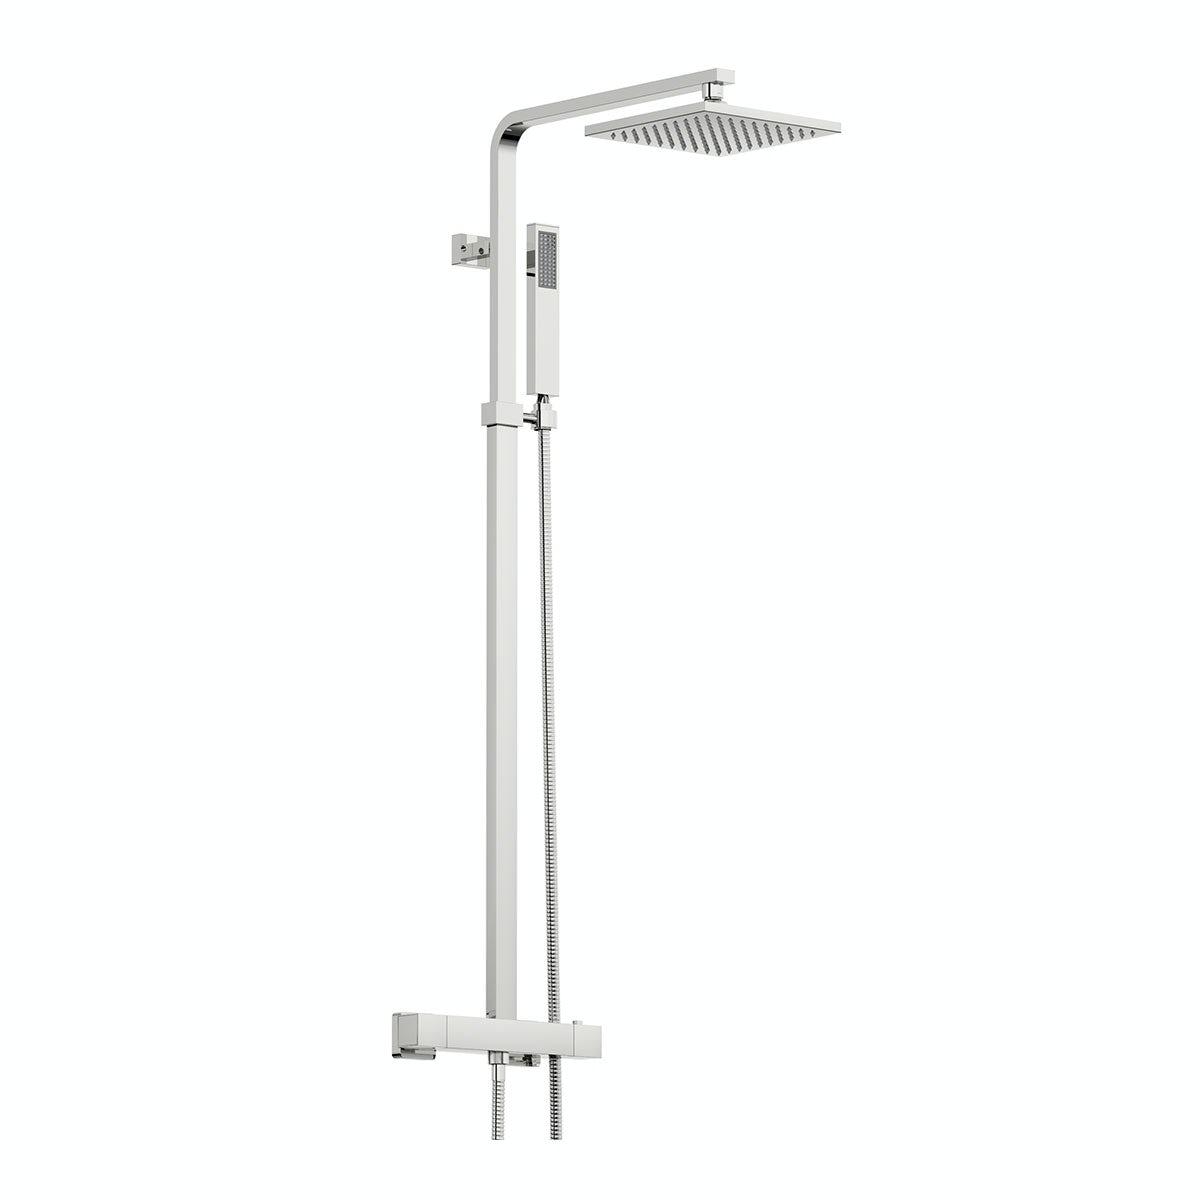 Orchard Wye thermostatic bar valve shower system | VictoriaPlum.com